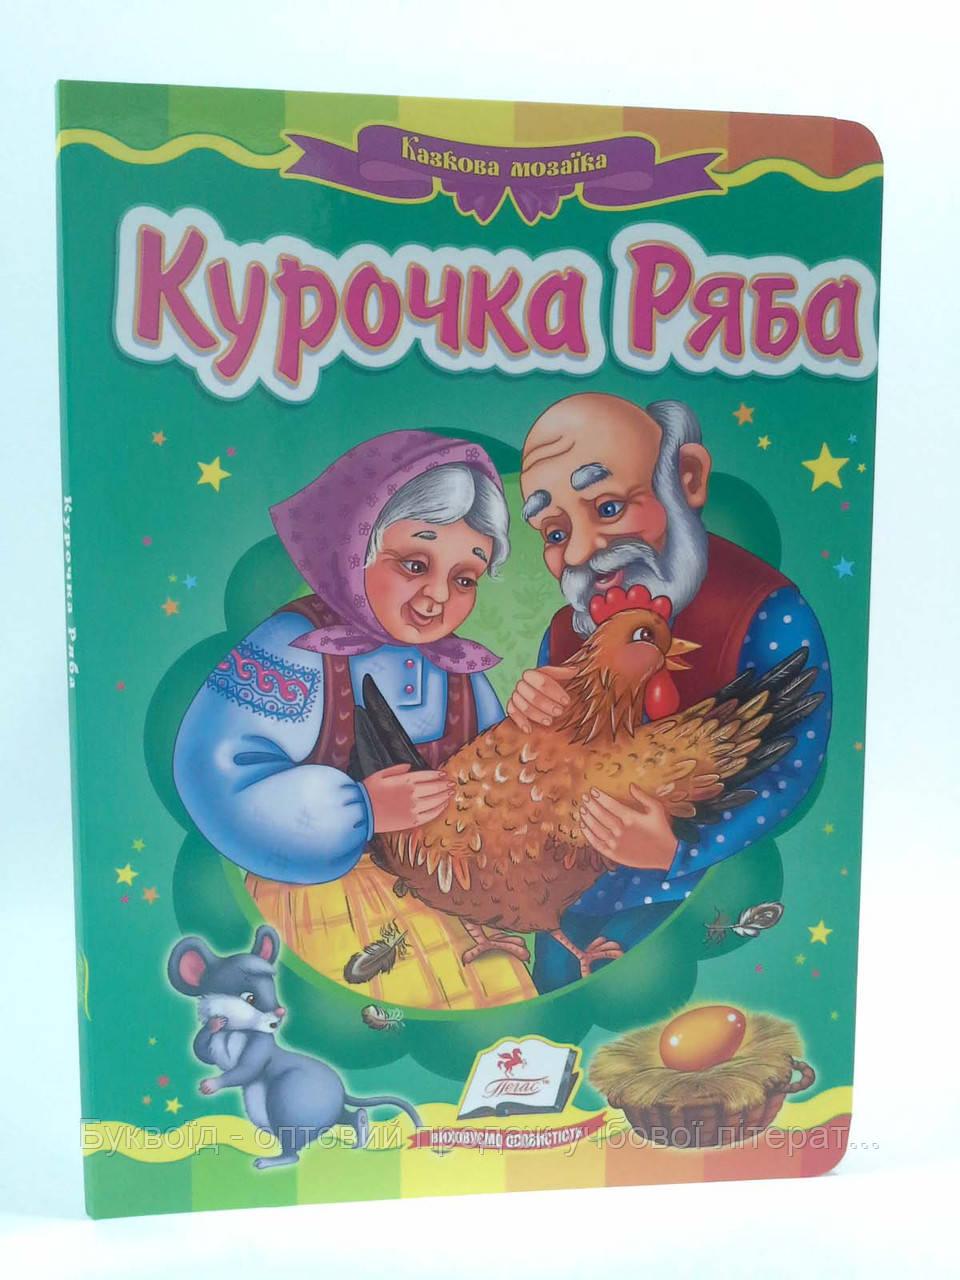 Картон Пегас Казкова мозаїка Курочка Ряба